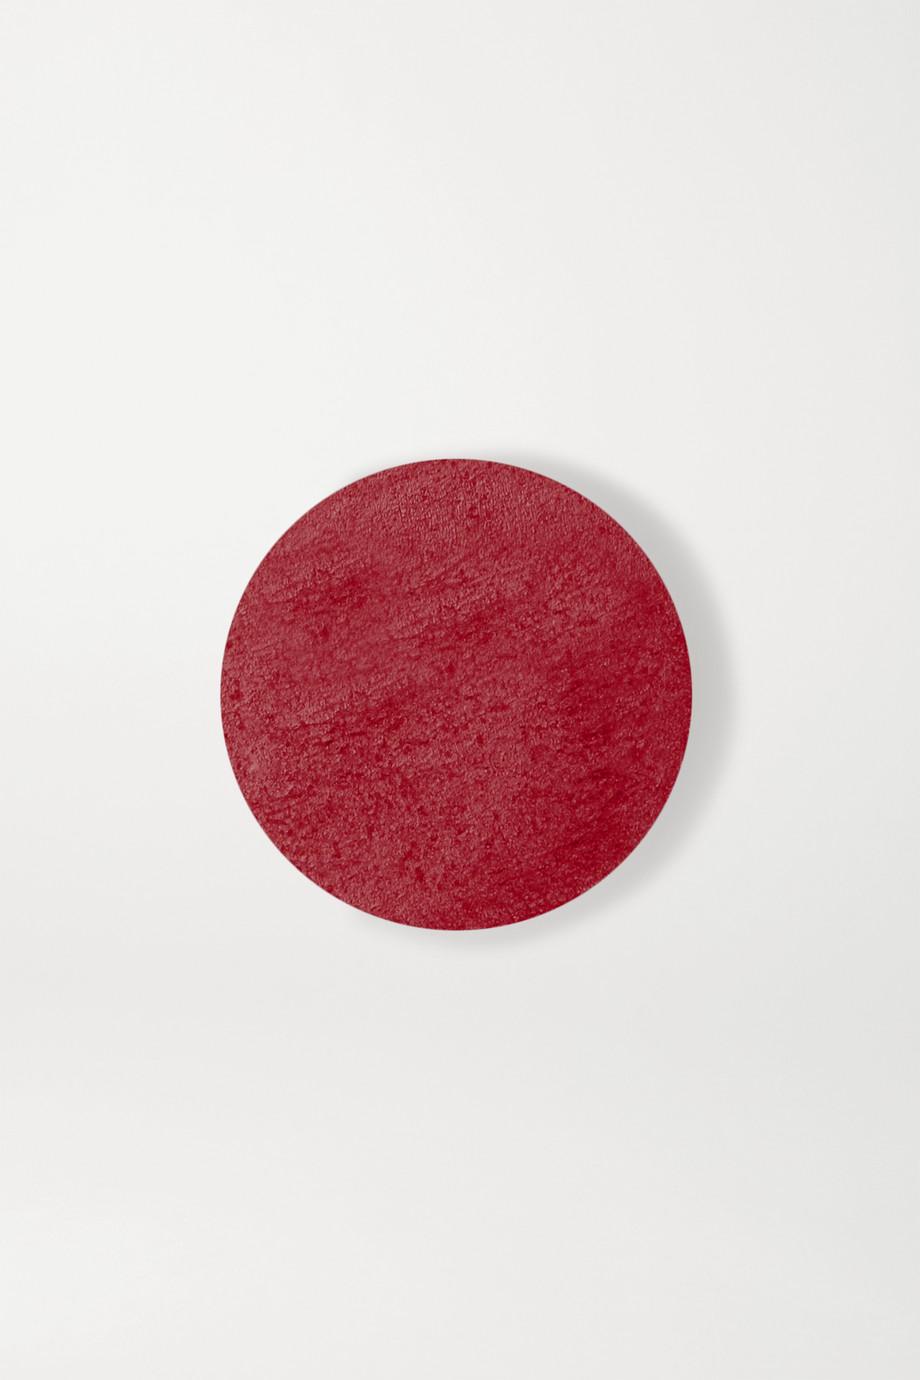 La Bouche Rouge Matte Lipstick Refill - Pop Art Red